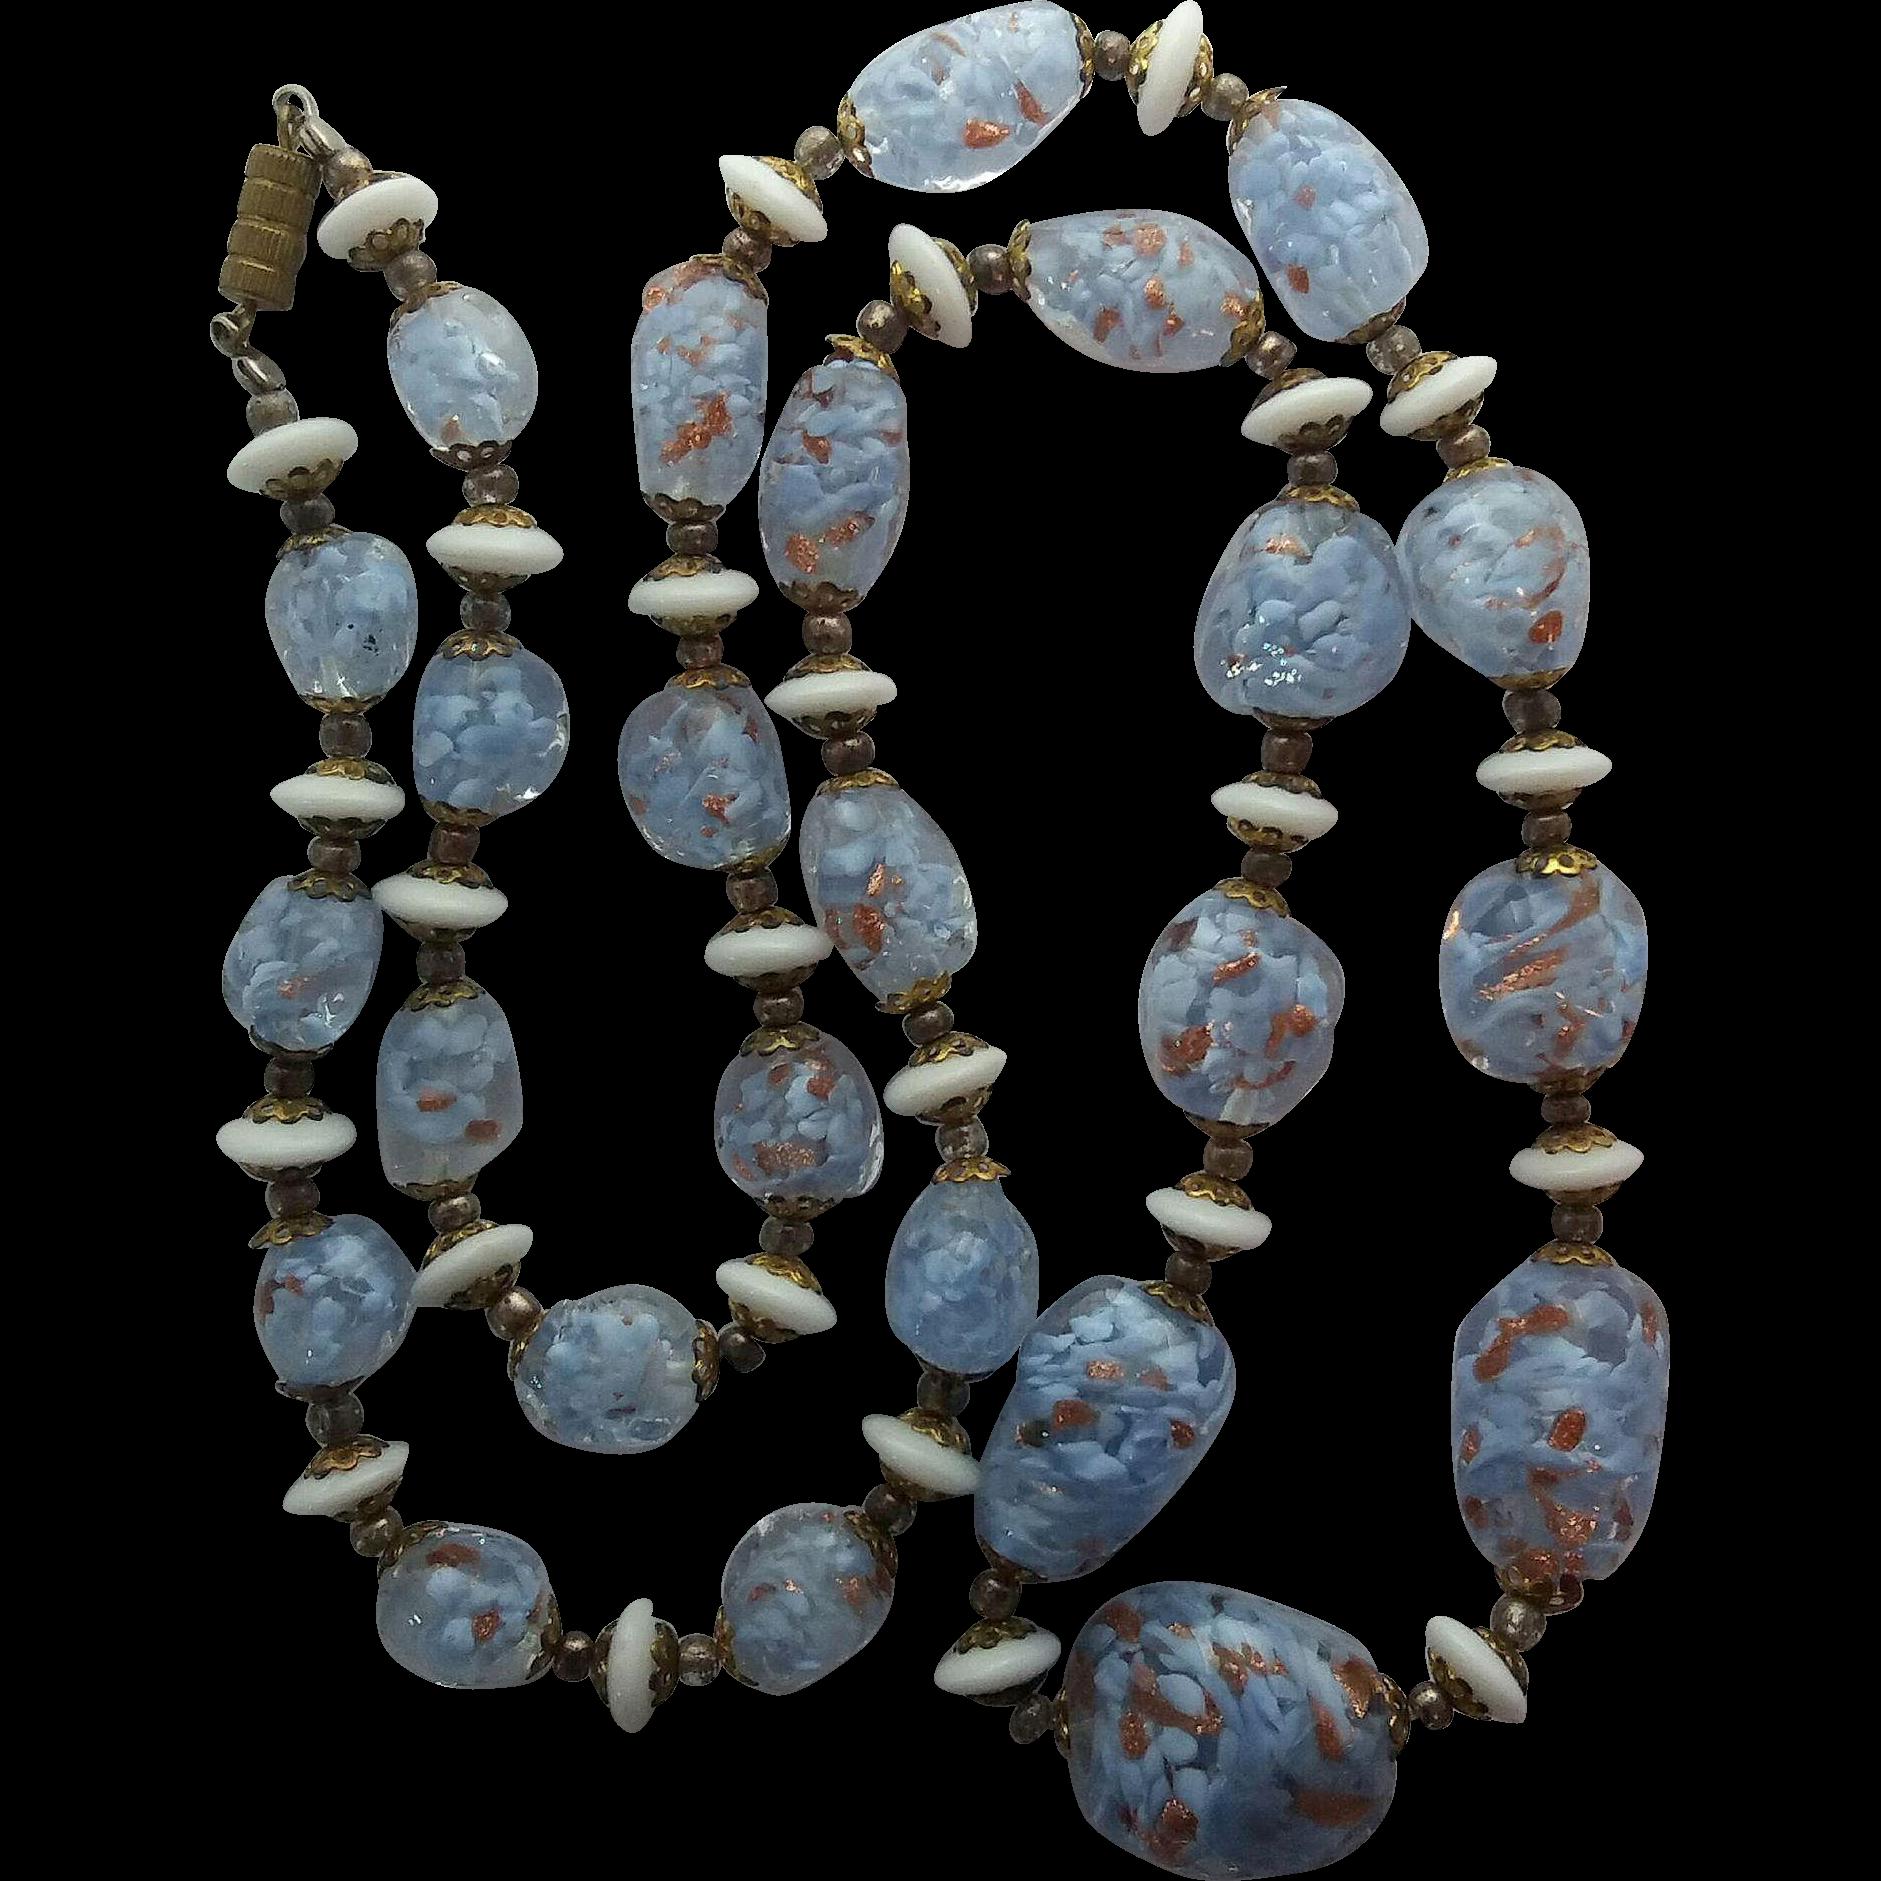 Vintage Venetian Light Blue Adventurine Free Form Murano Art Glass Beads Bead Necklace